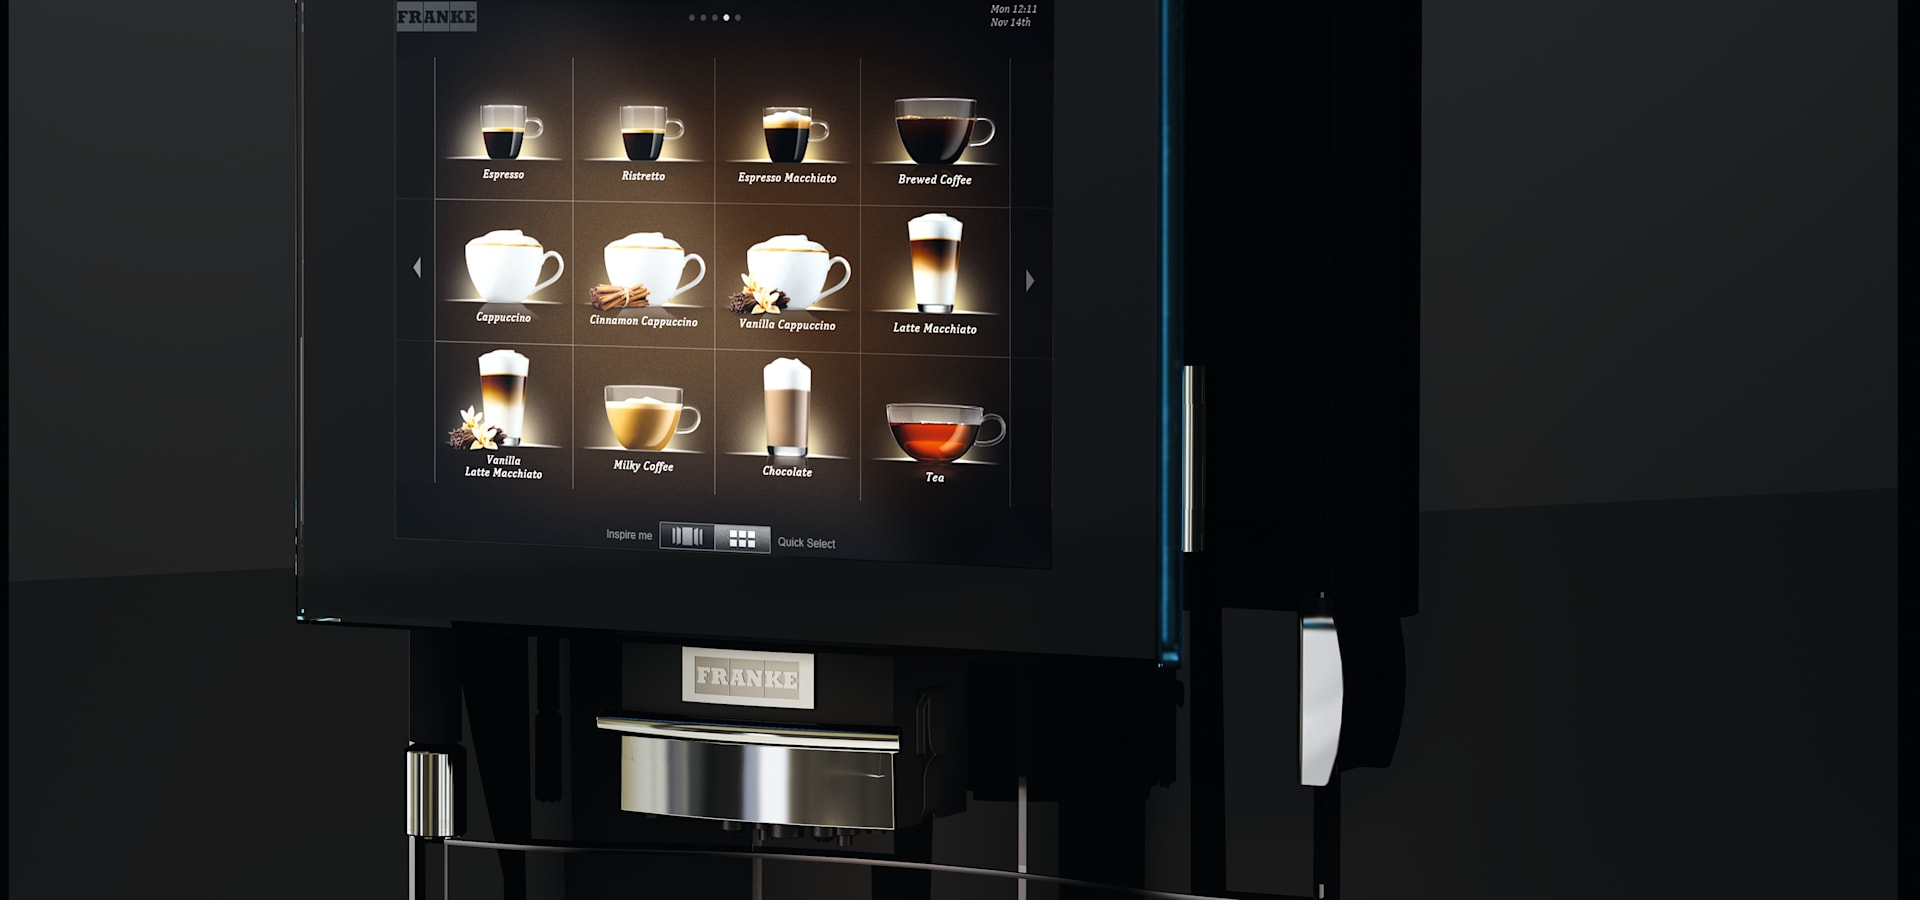 Franke Coffee Systems GmbH